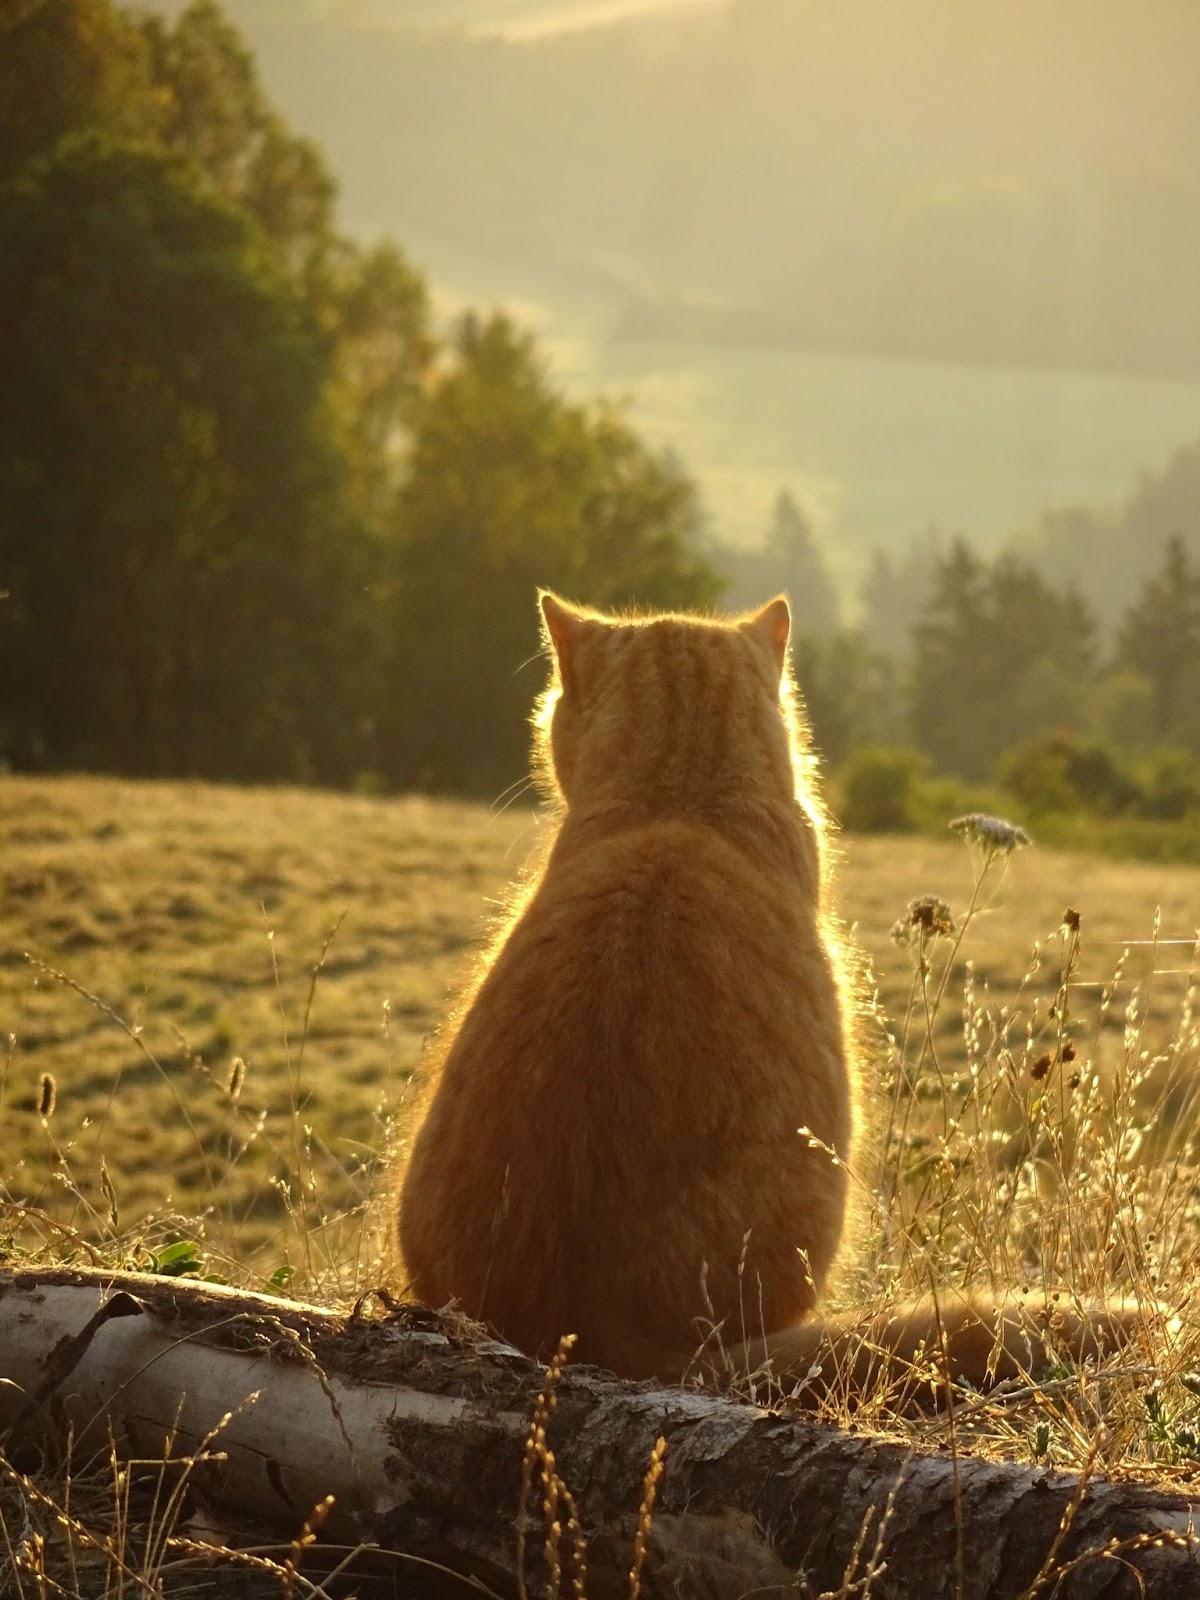 Eben otevřené kočička obrázky